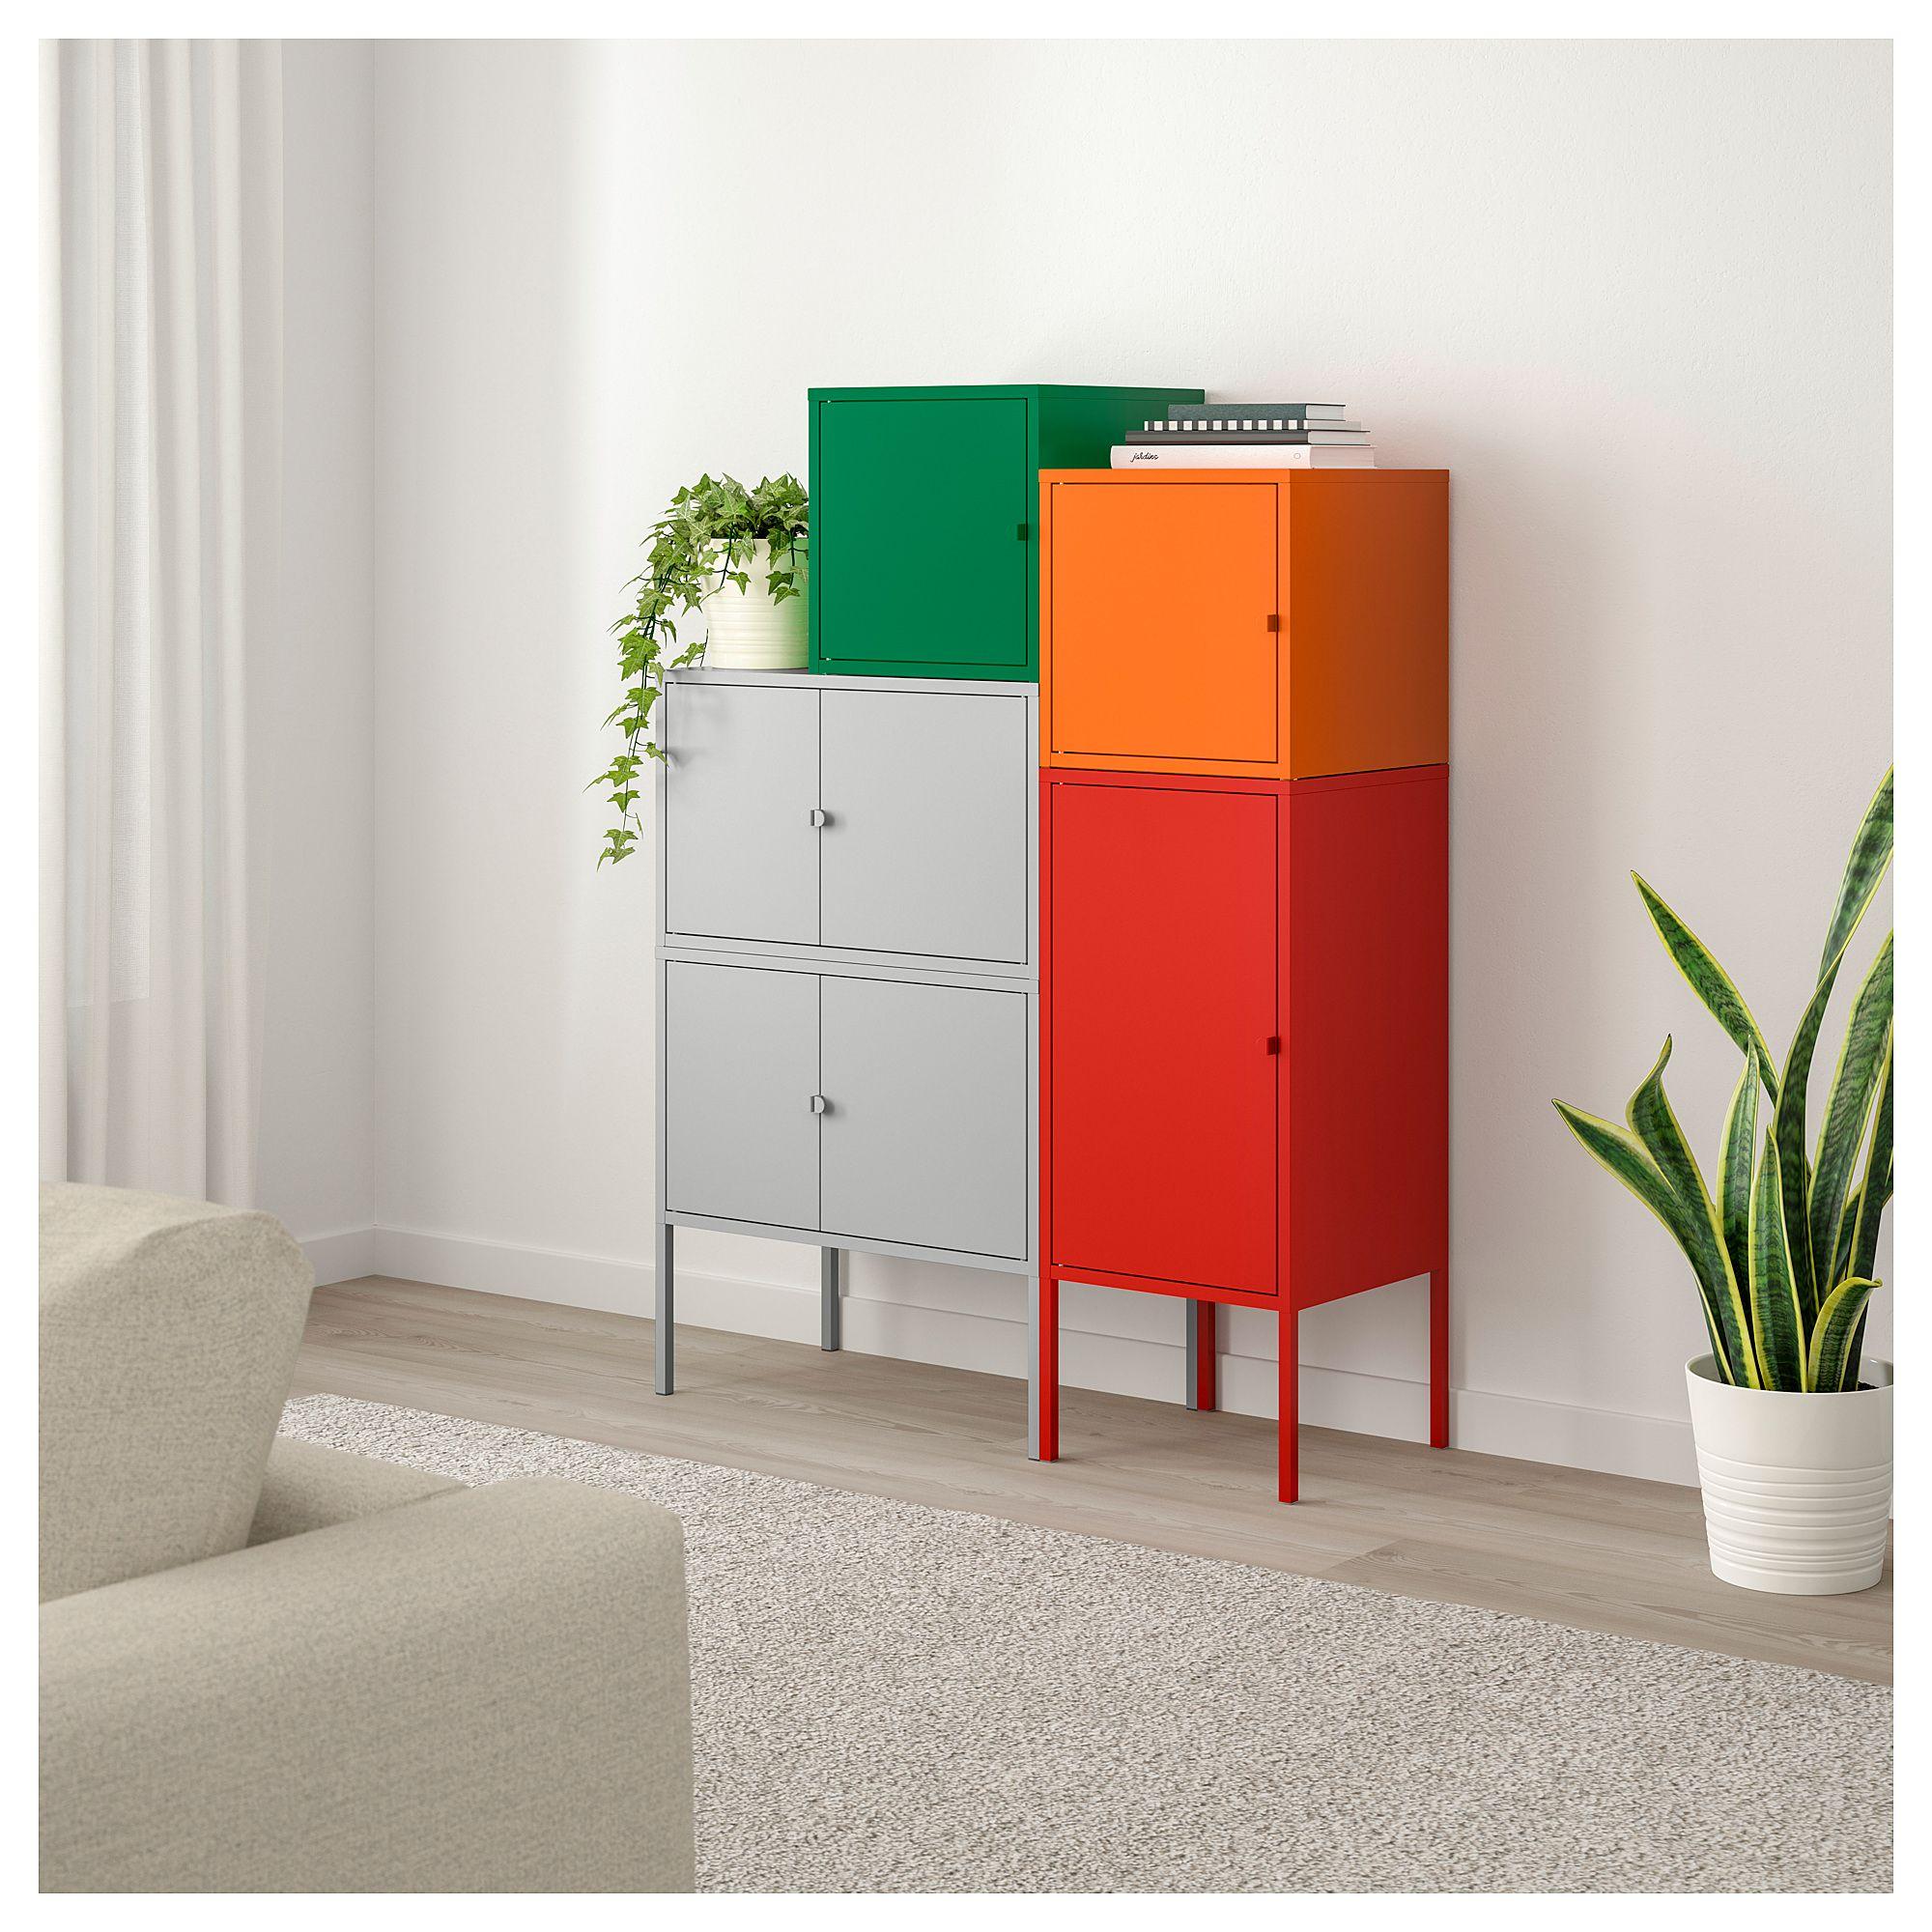 IKEA LIXHULT Storage combination gray dark green, red